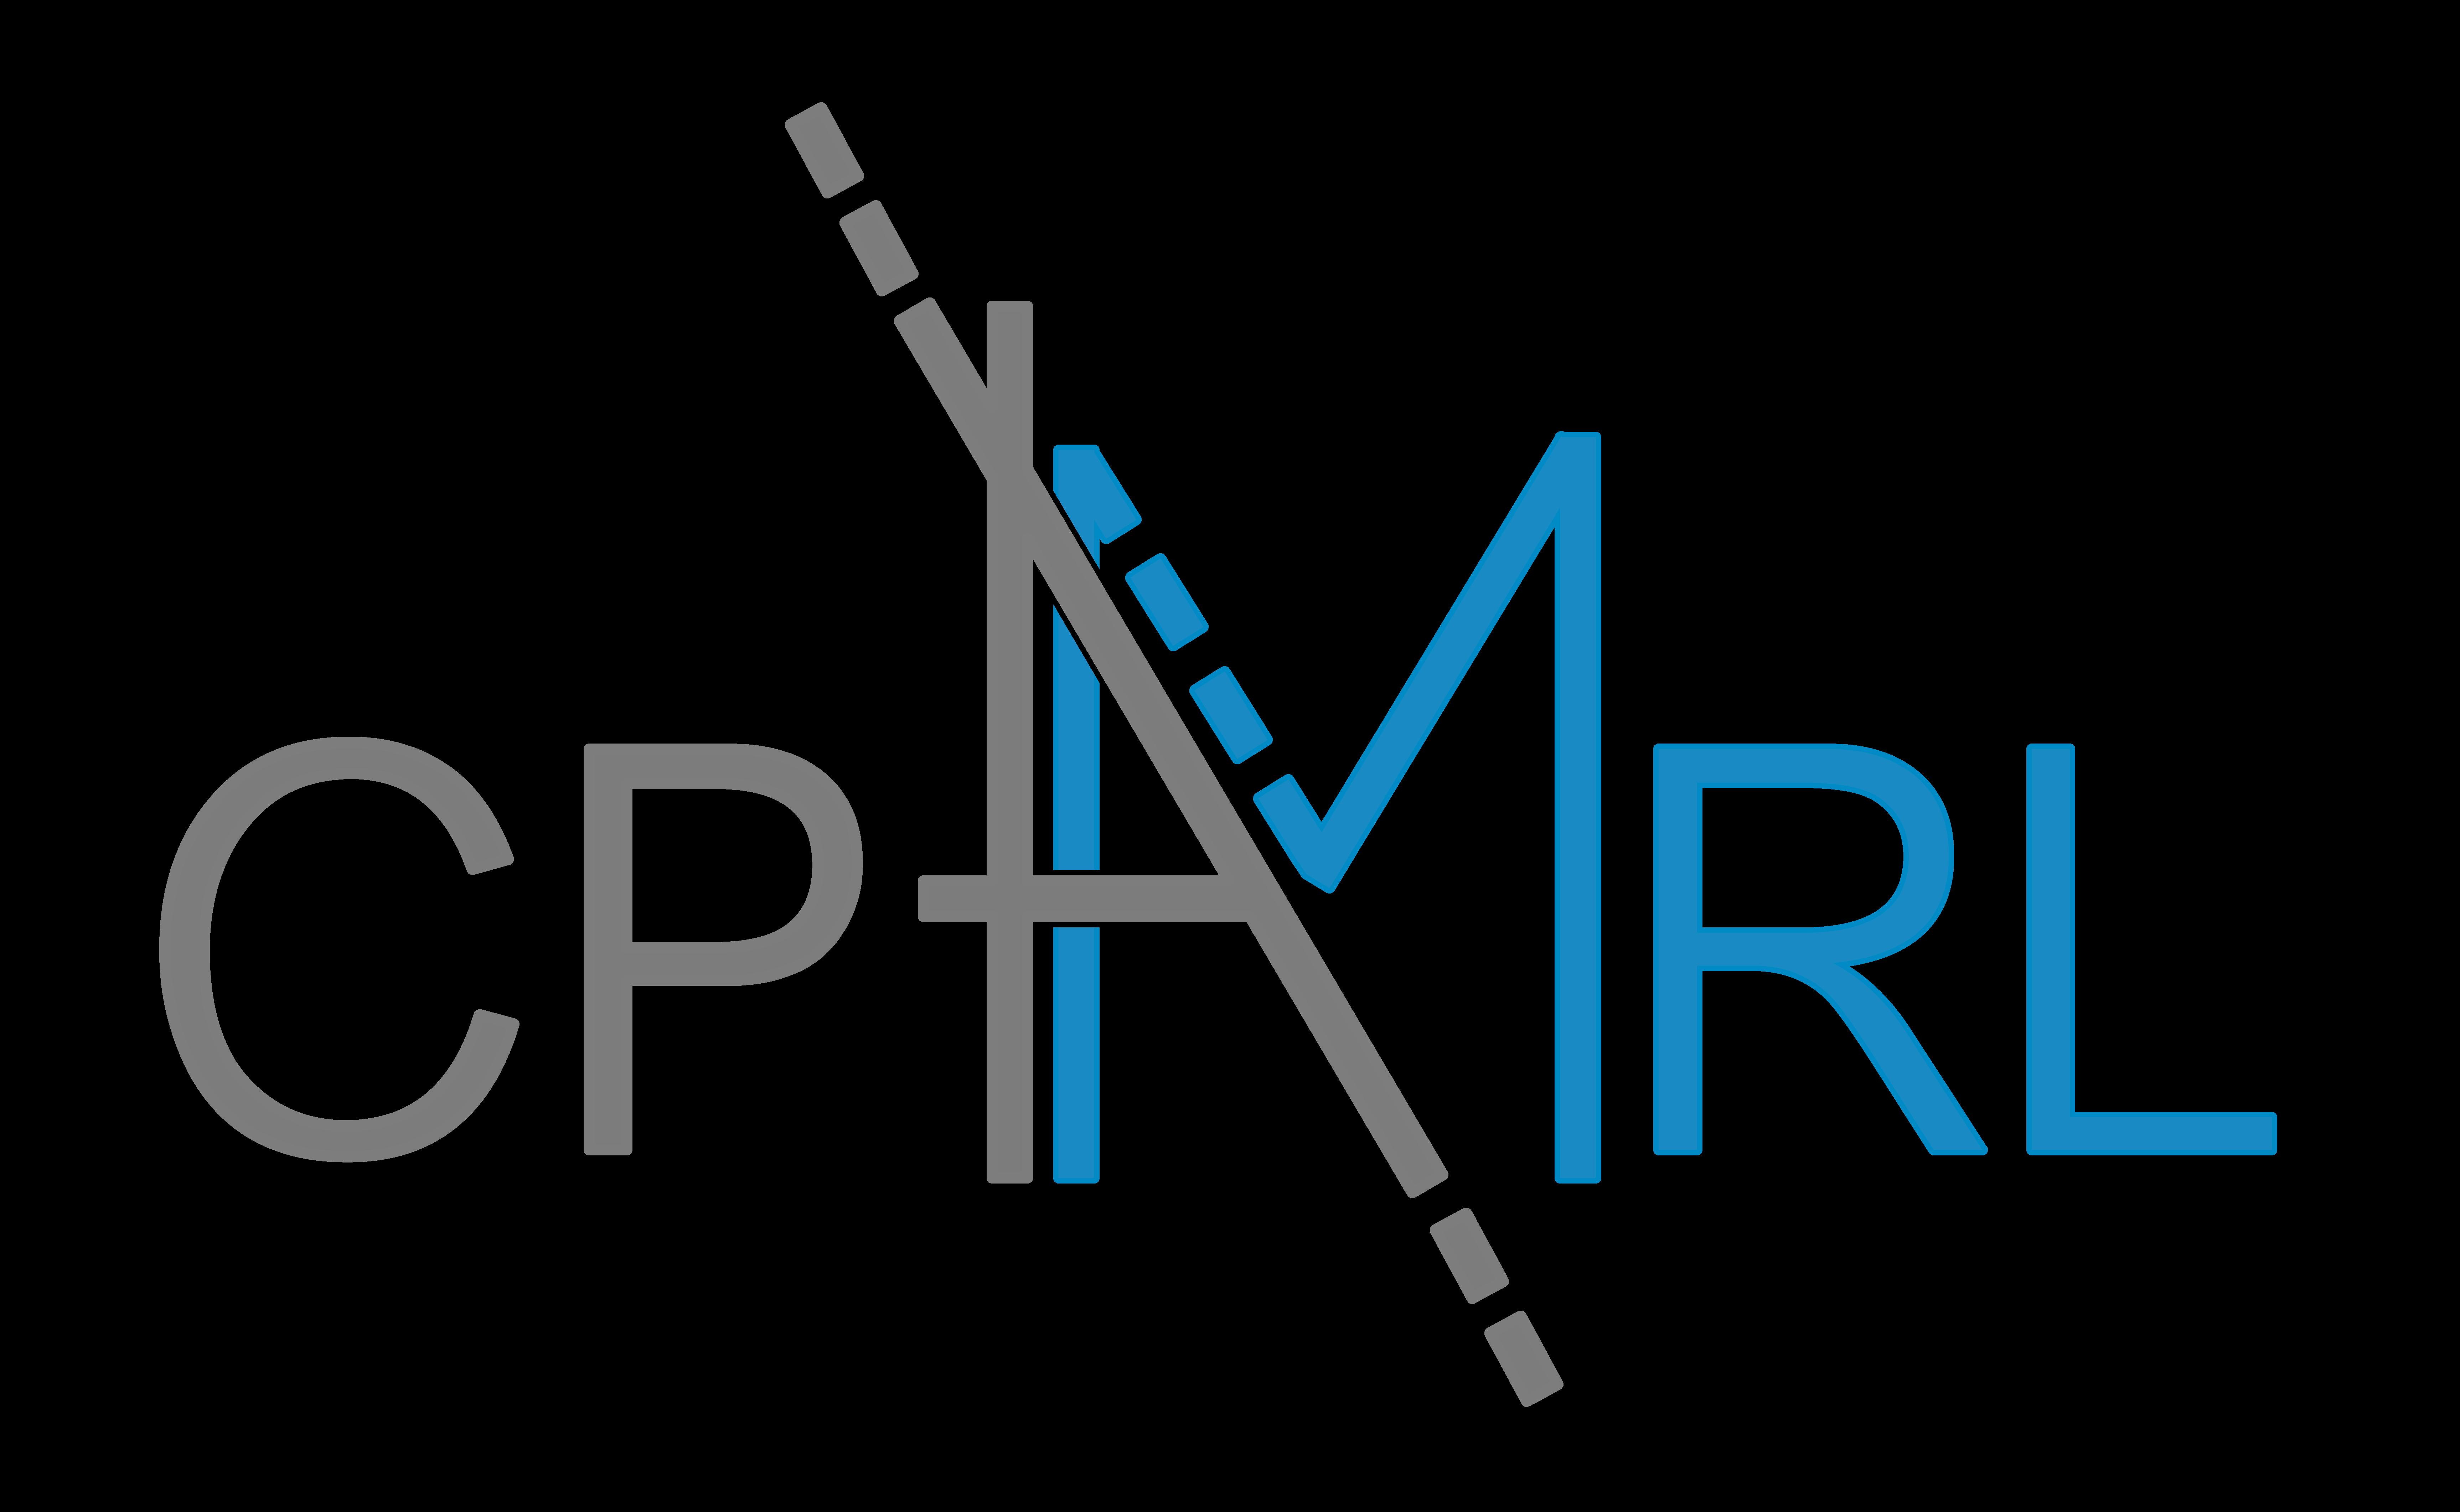 Cpa-Mrl